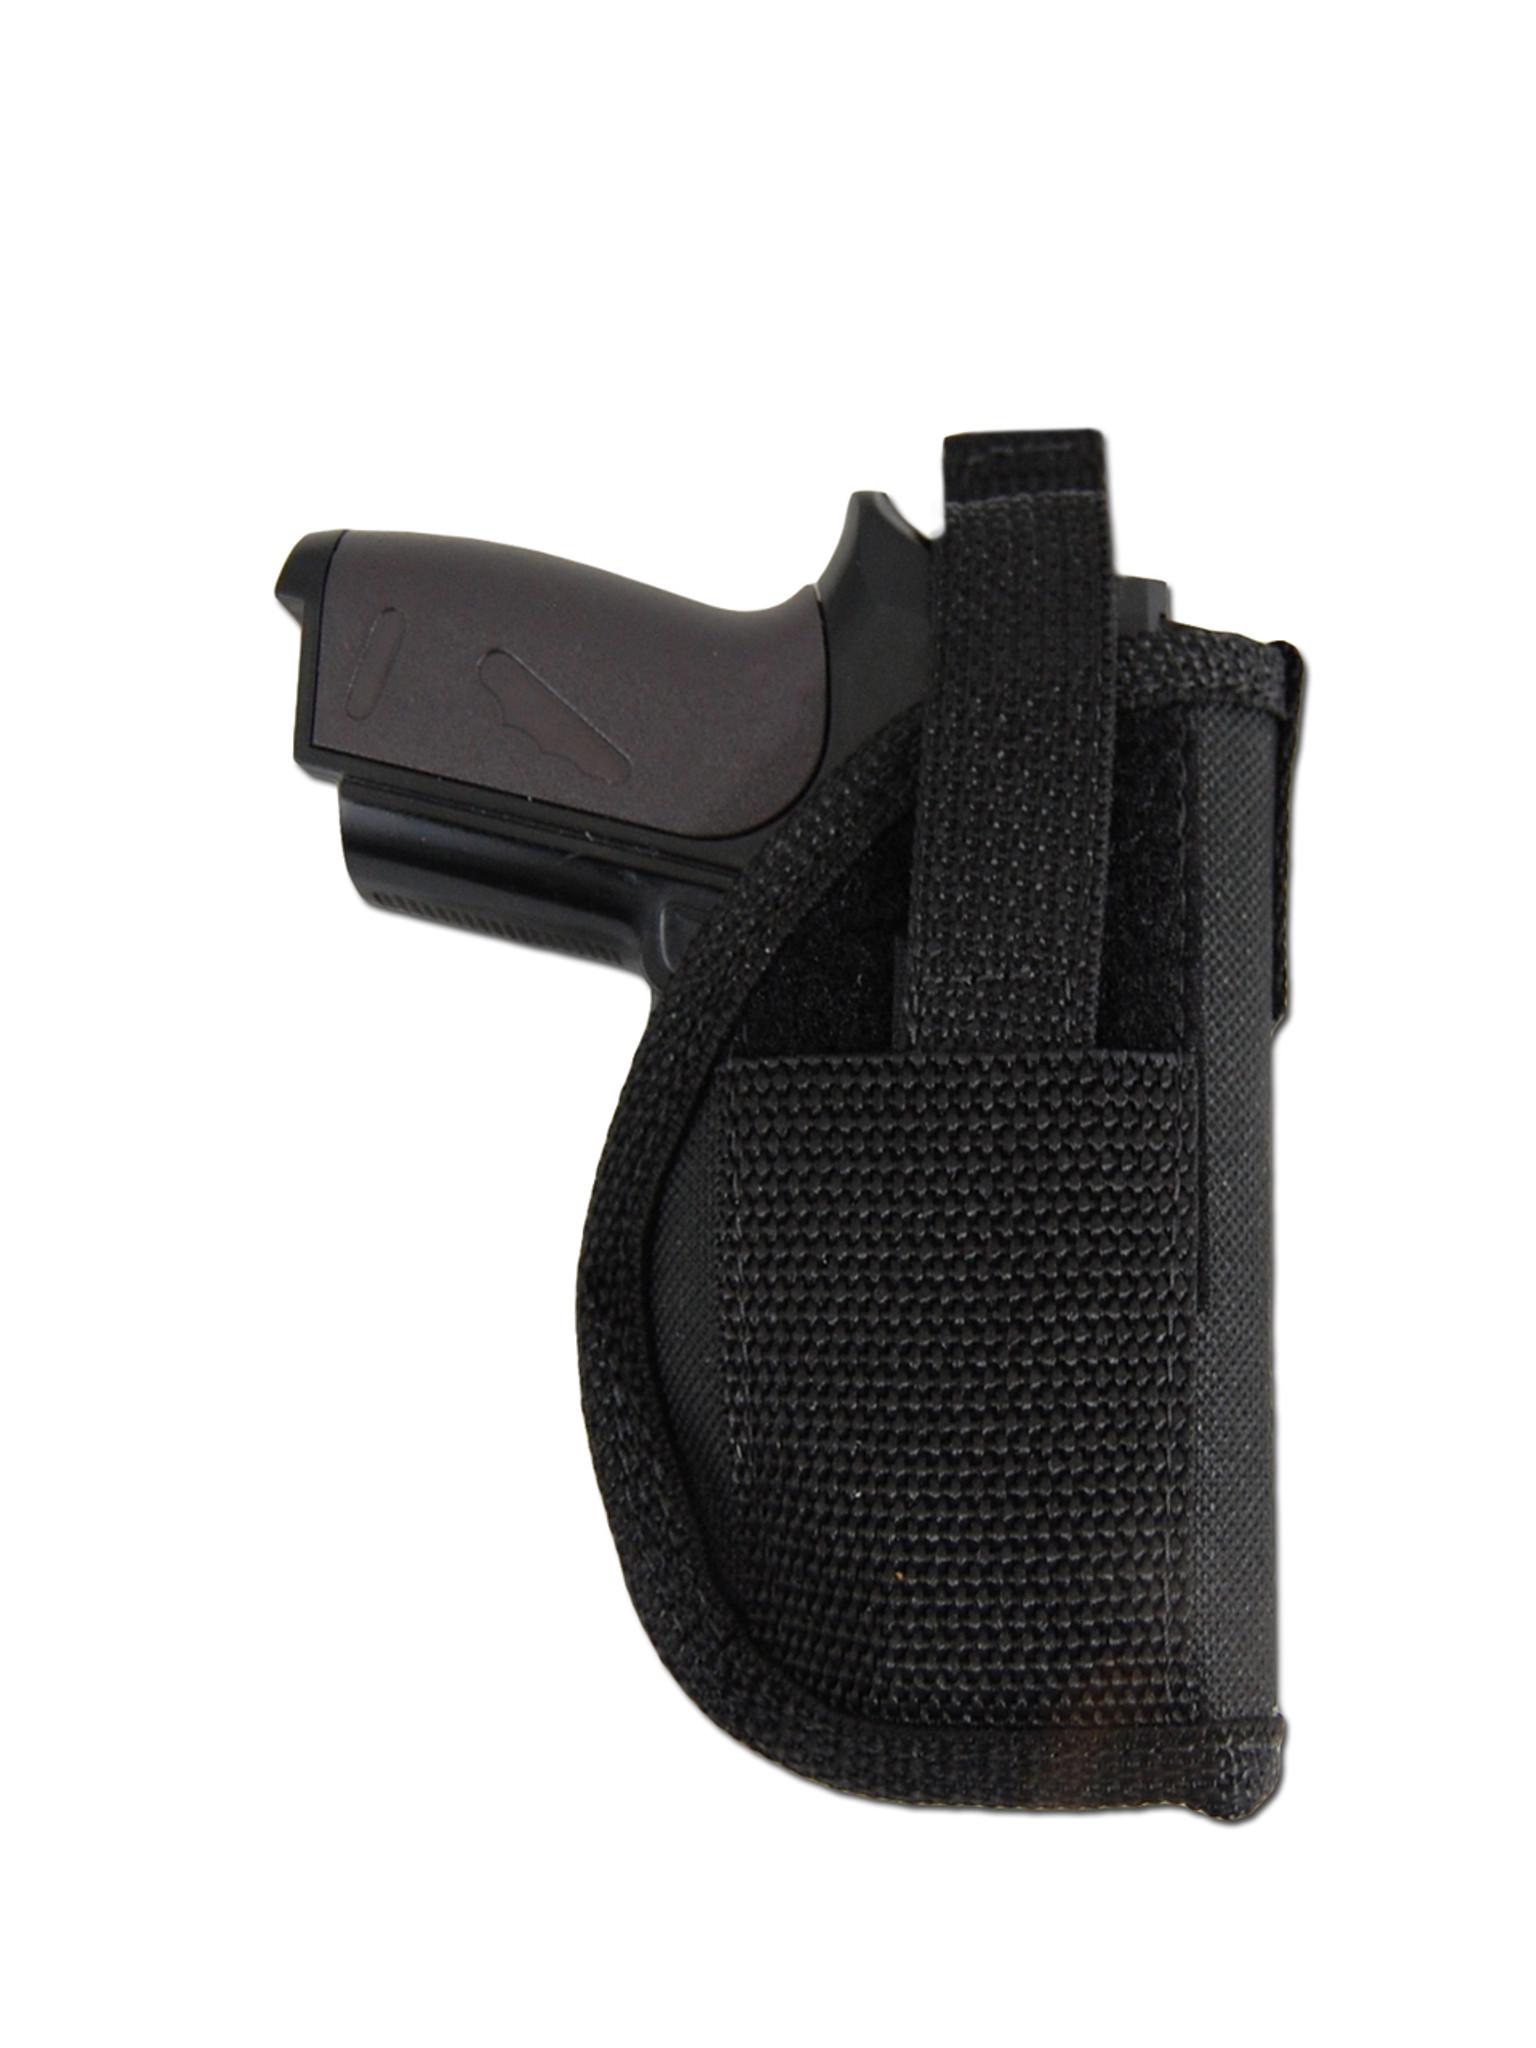 Belt Holster for Mini/Pocket  22  25  32  380 Pistols with